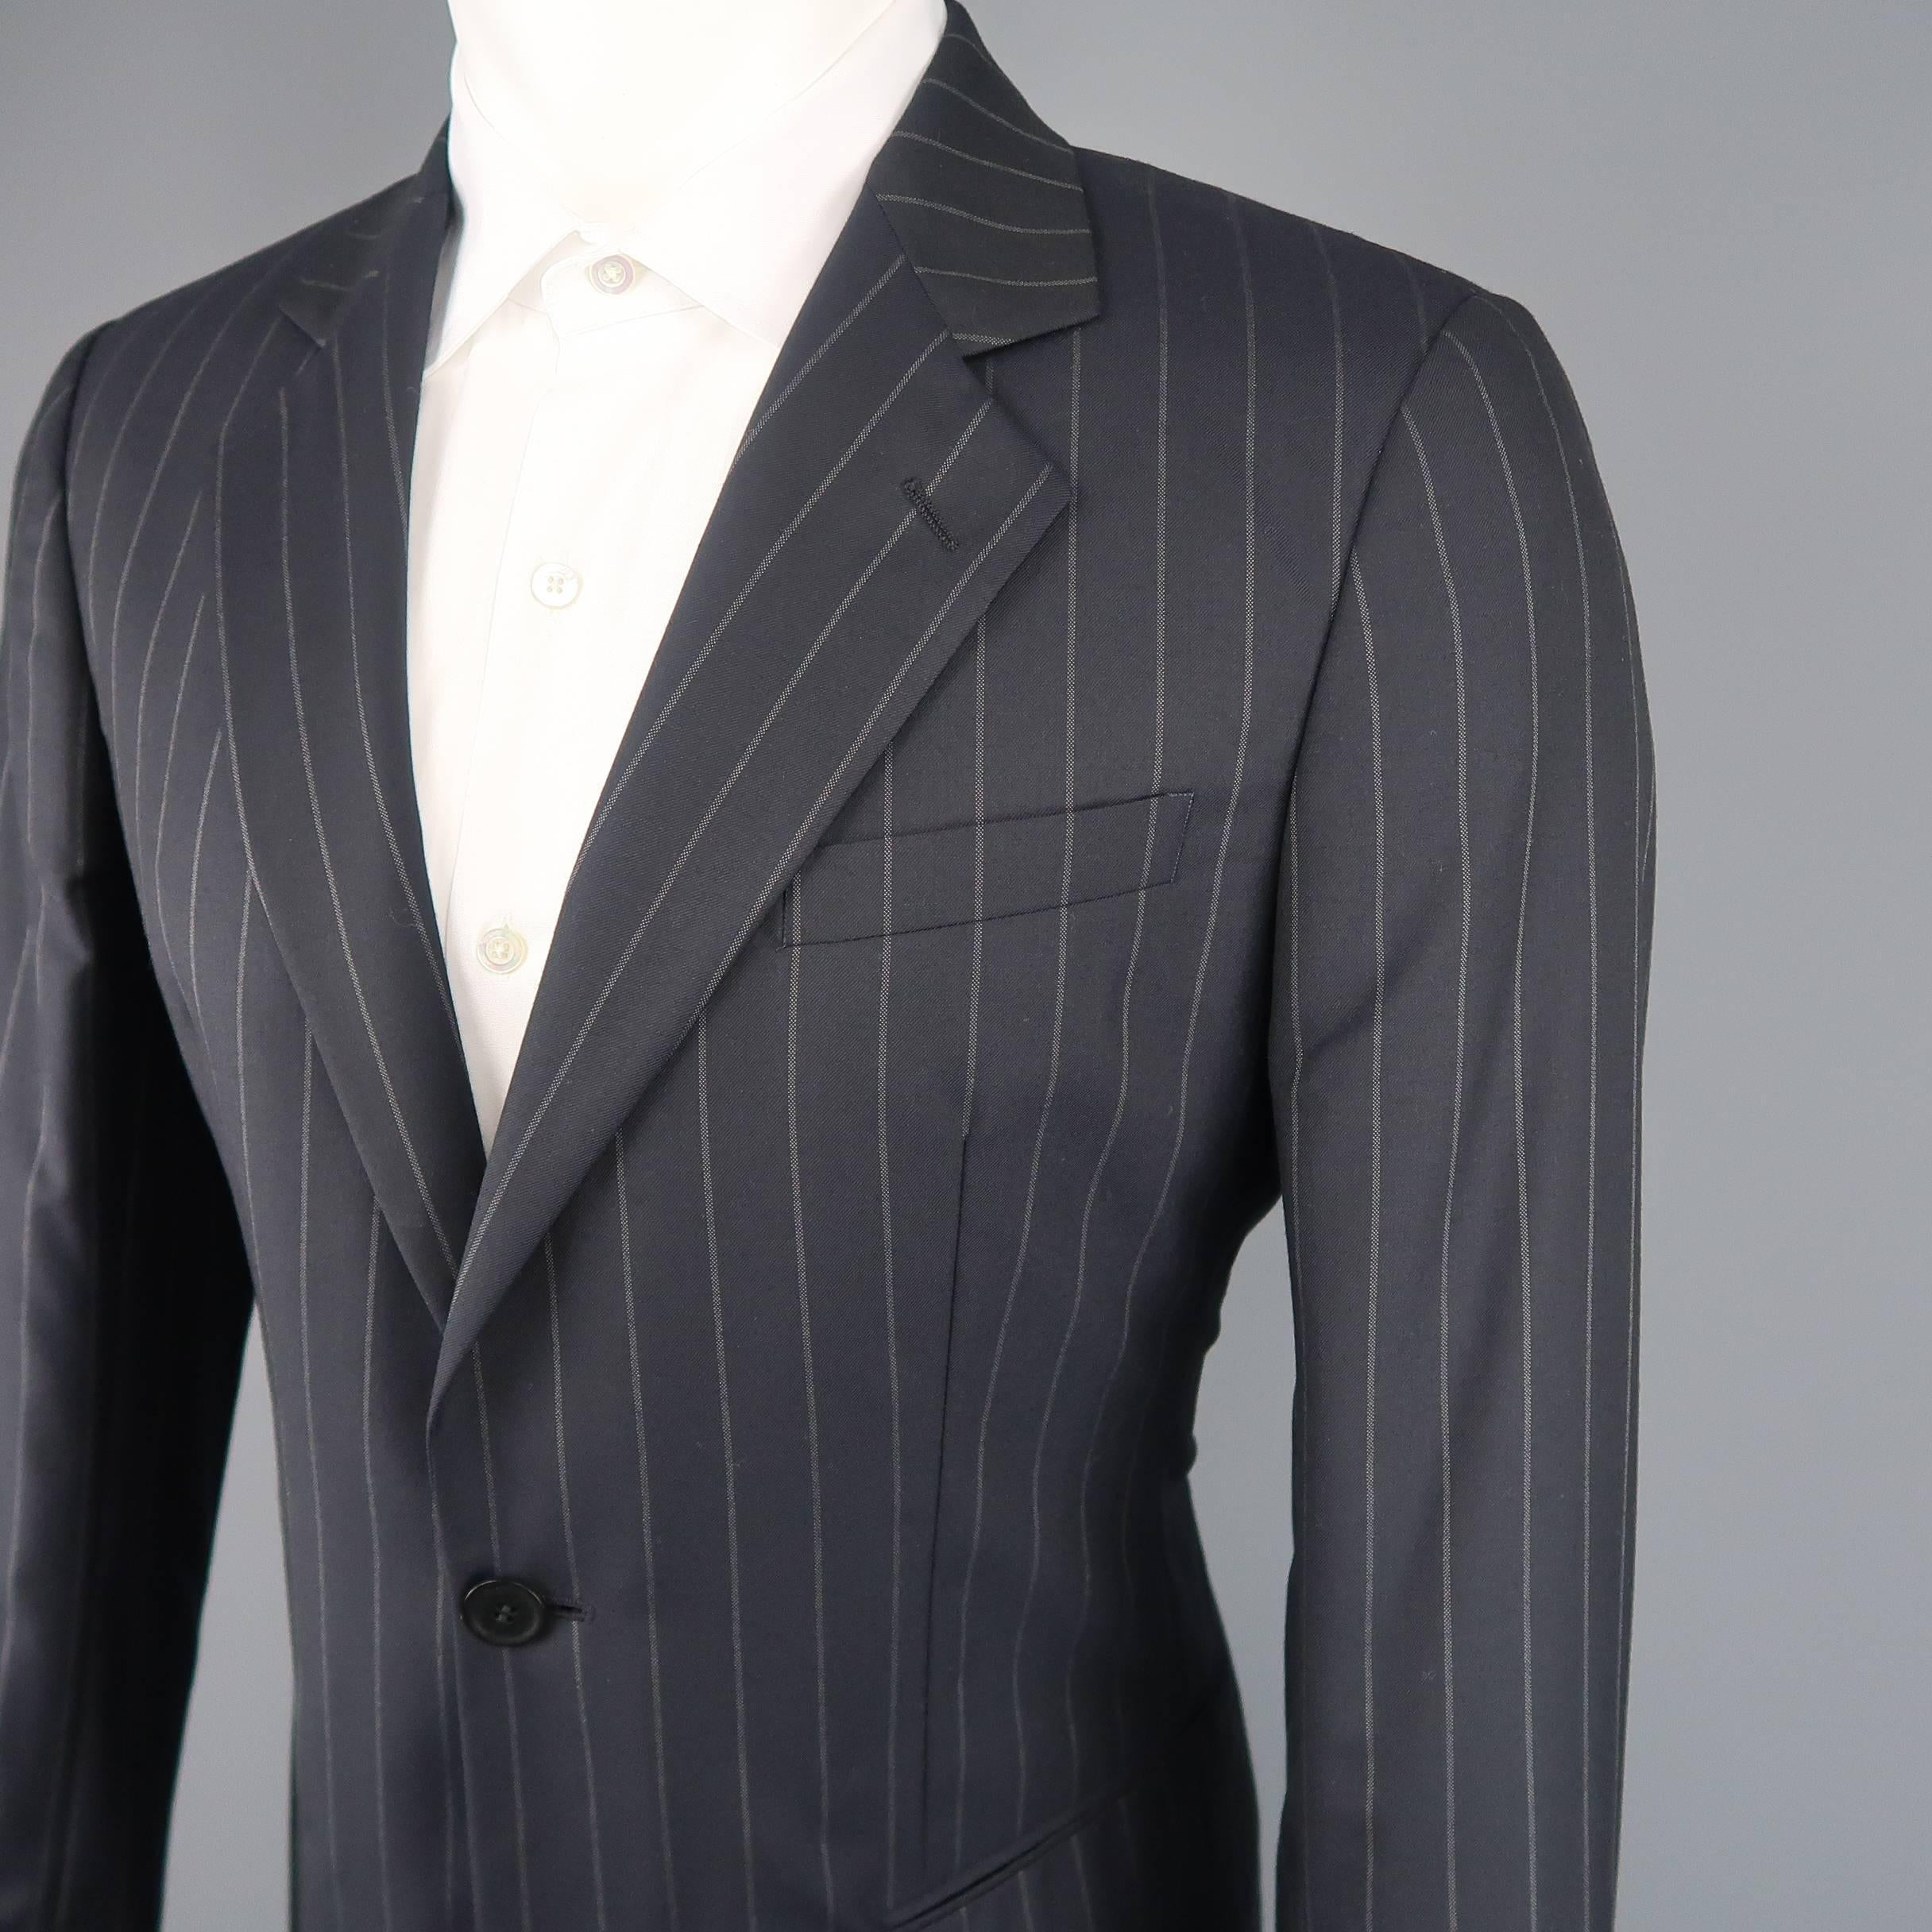 eb90df73780 Men s GIORGIO ARMANI 40 Regular Navy Stripe Wool Single Button Notch Lapel  Suit For Sale at 1stdibs